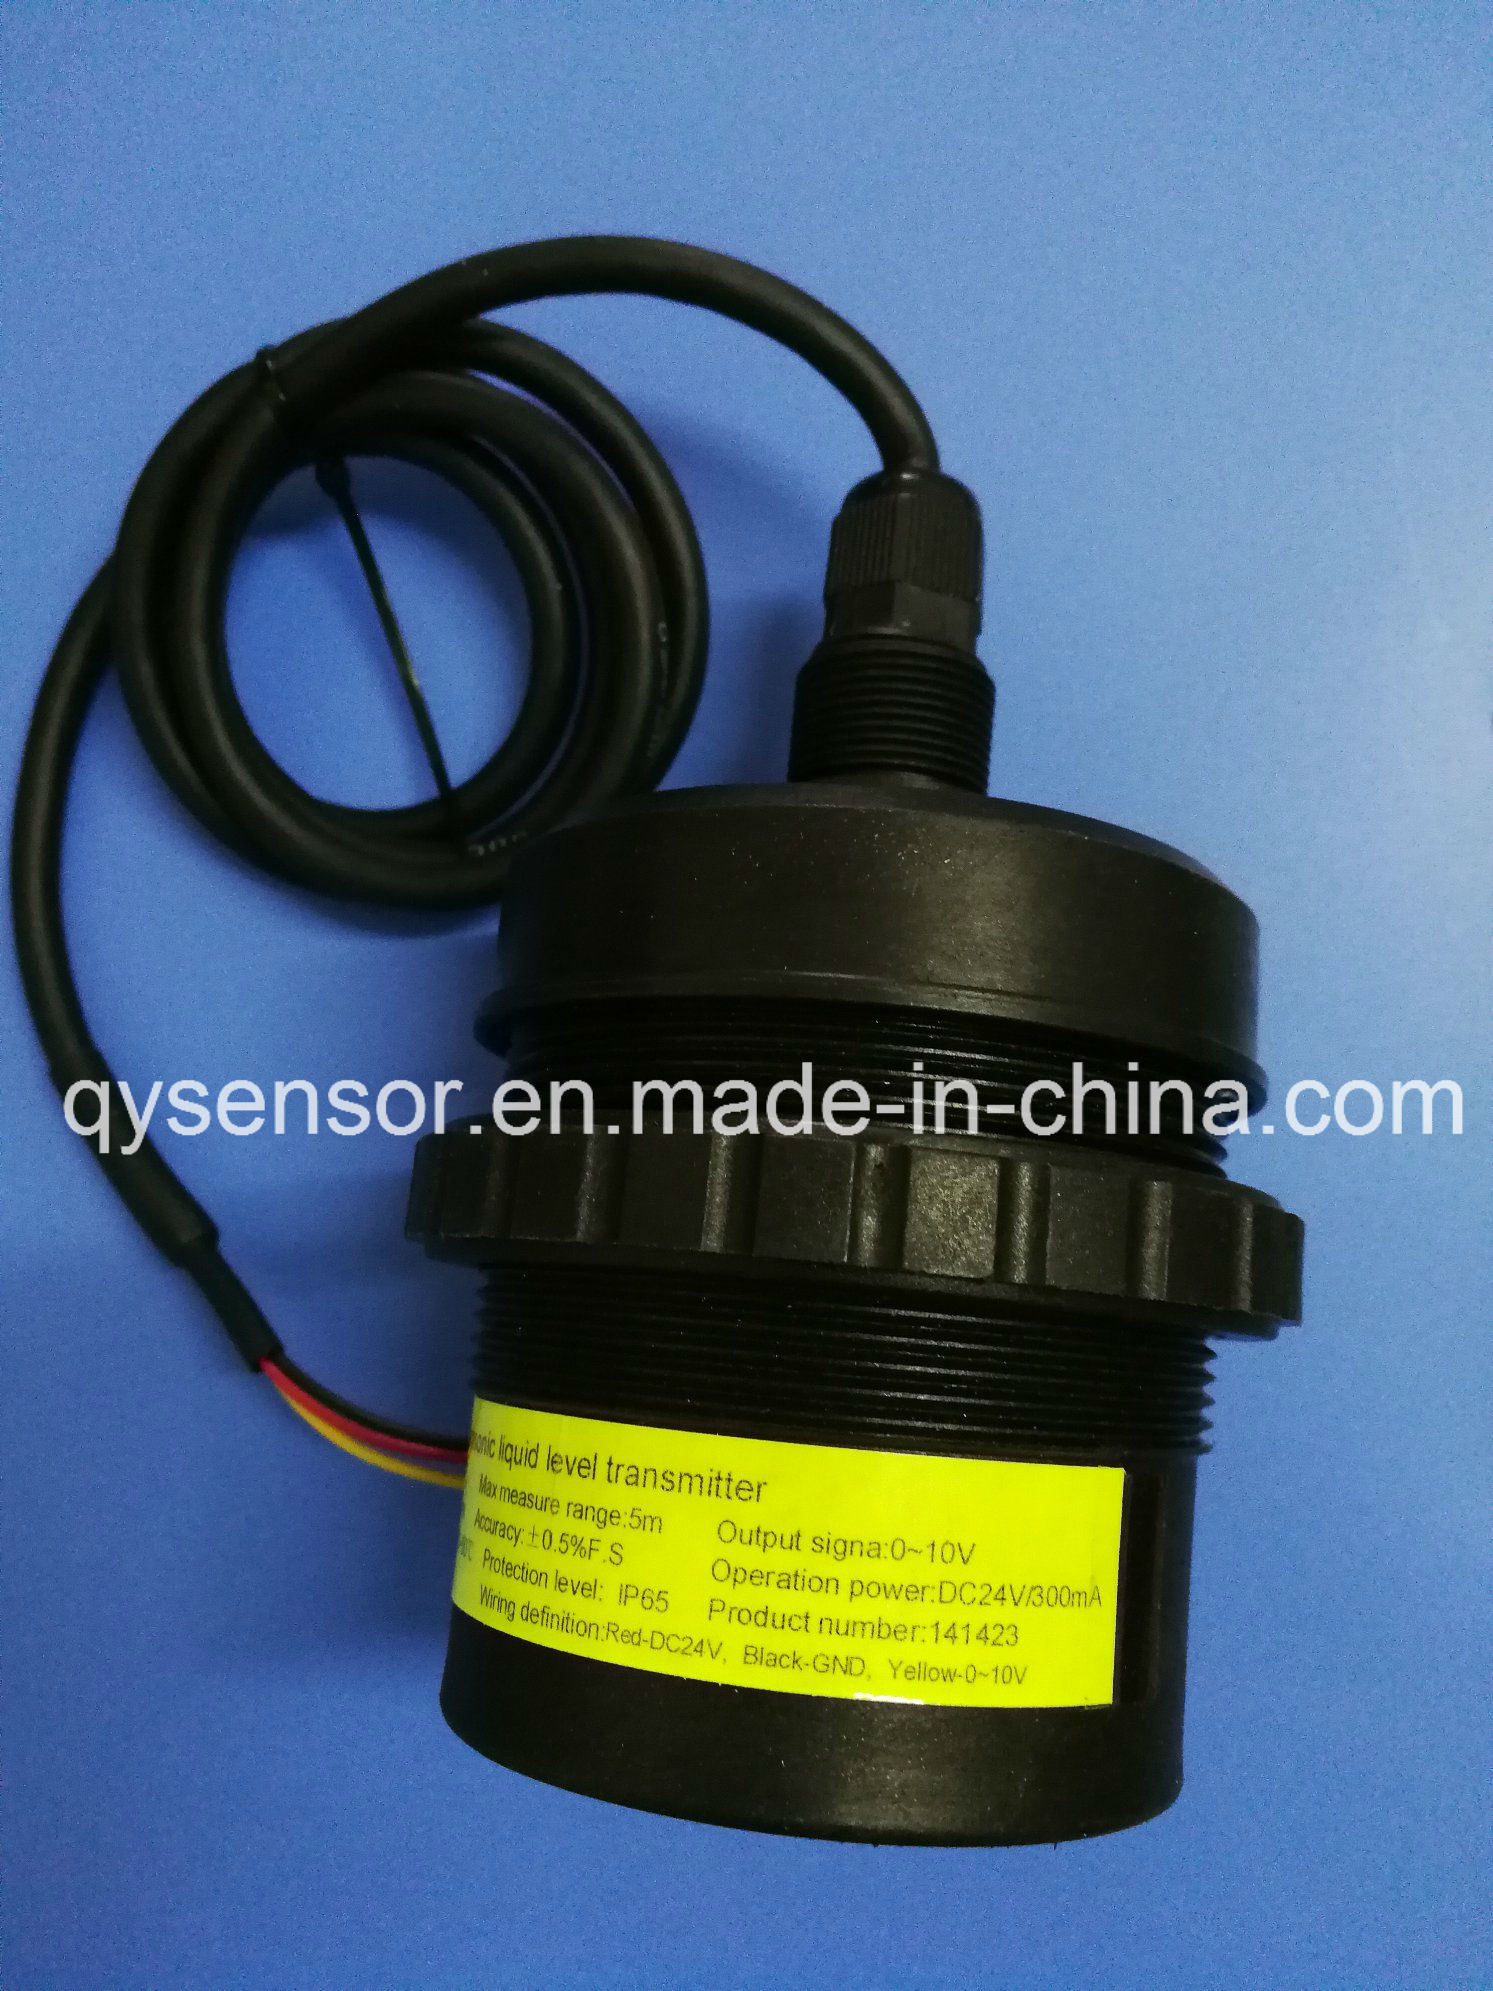 Wholesale Ultrasonic Transducer Buy Reliable Transducerultrasonic Humidifier Piezoelectric Transducertransducer Waterproof Distance Sensor Level